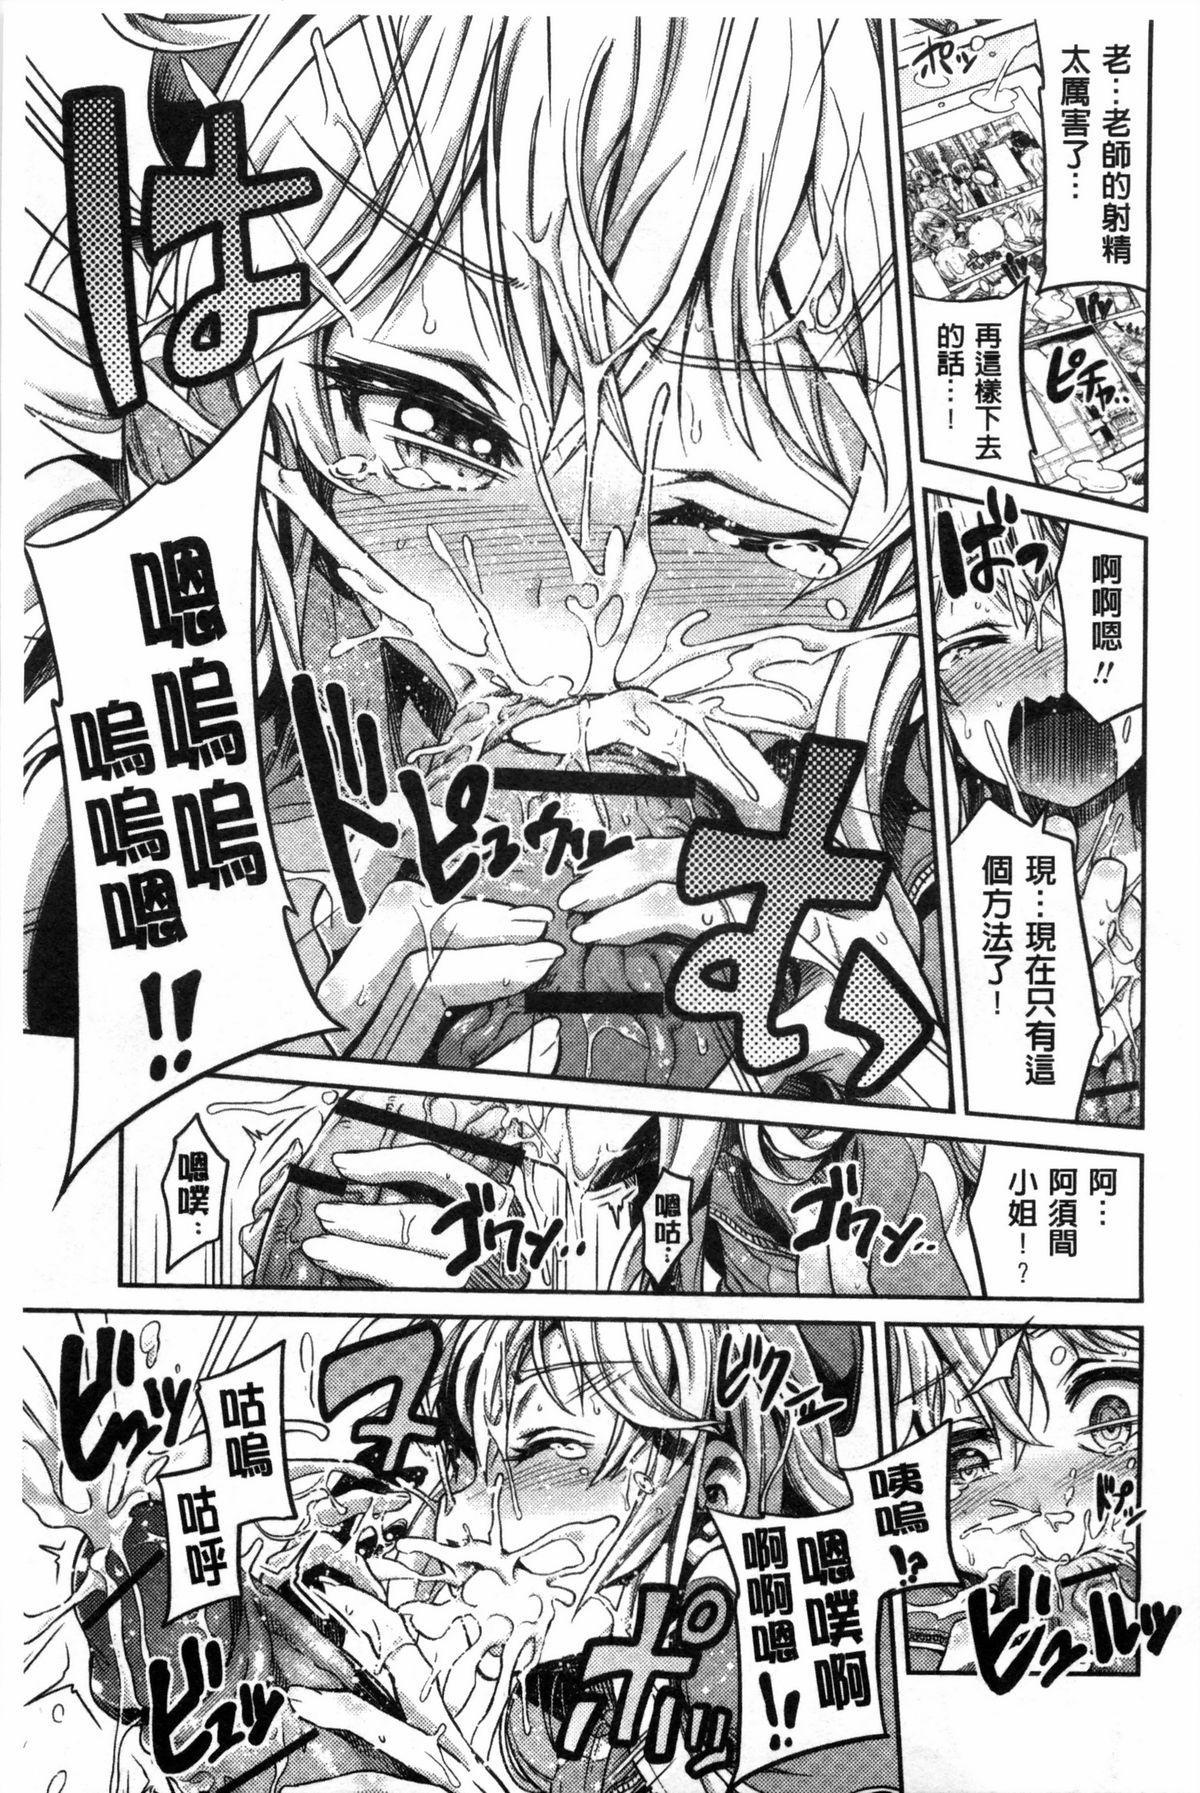 Man x Koi - Ero Manga de Hajimaru Koi no Plot   A漫×戀情 由情色漫畫所萌生的戀之物語 19